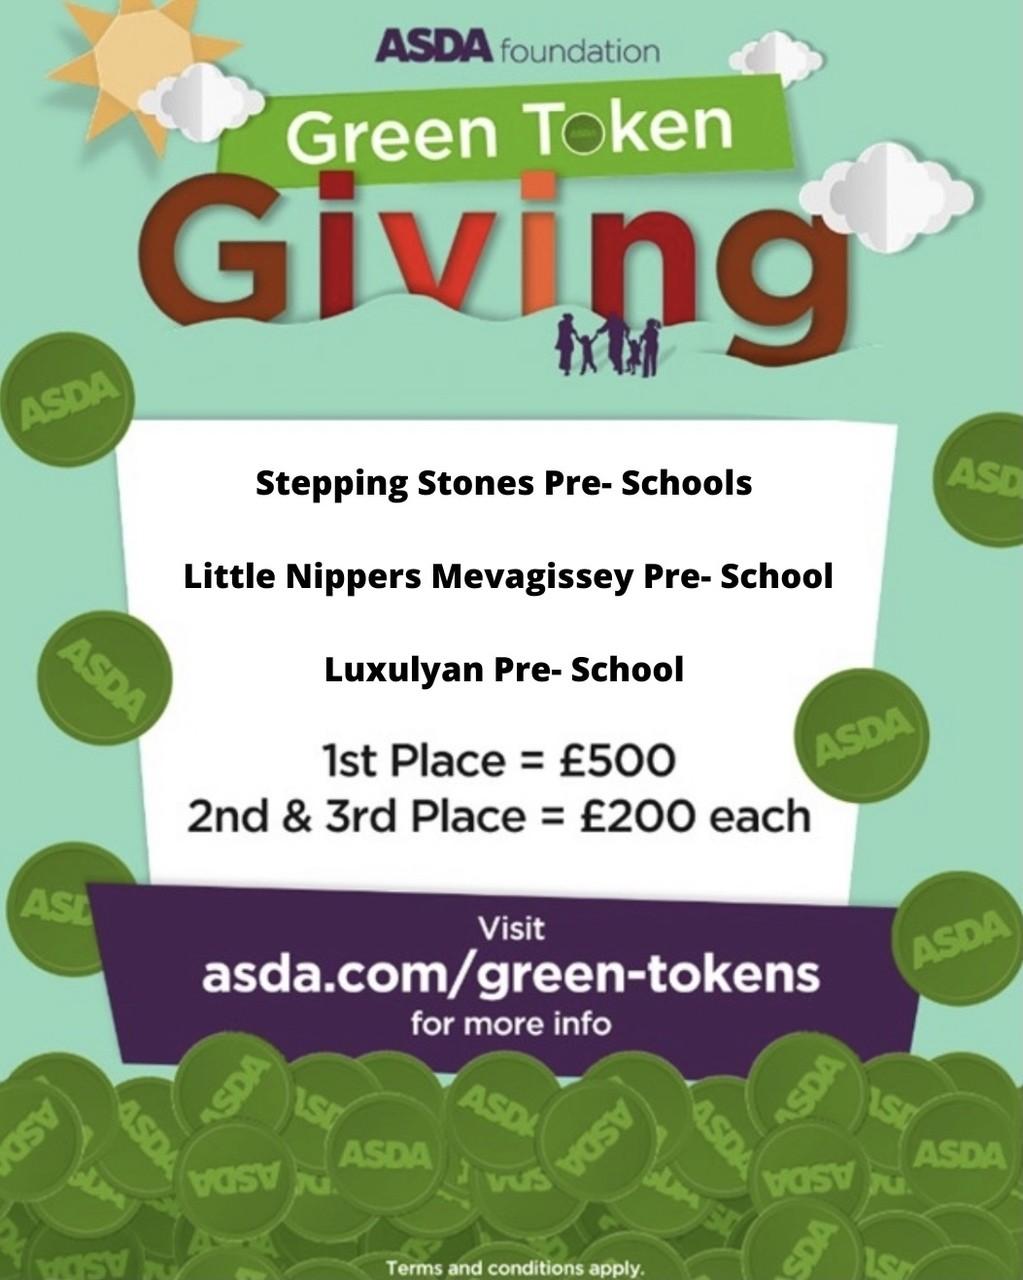 Green token giving | Asda St Austell